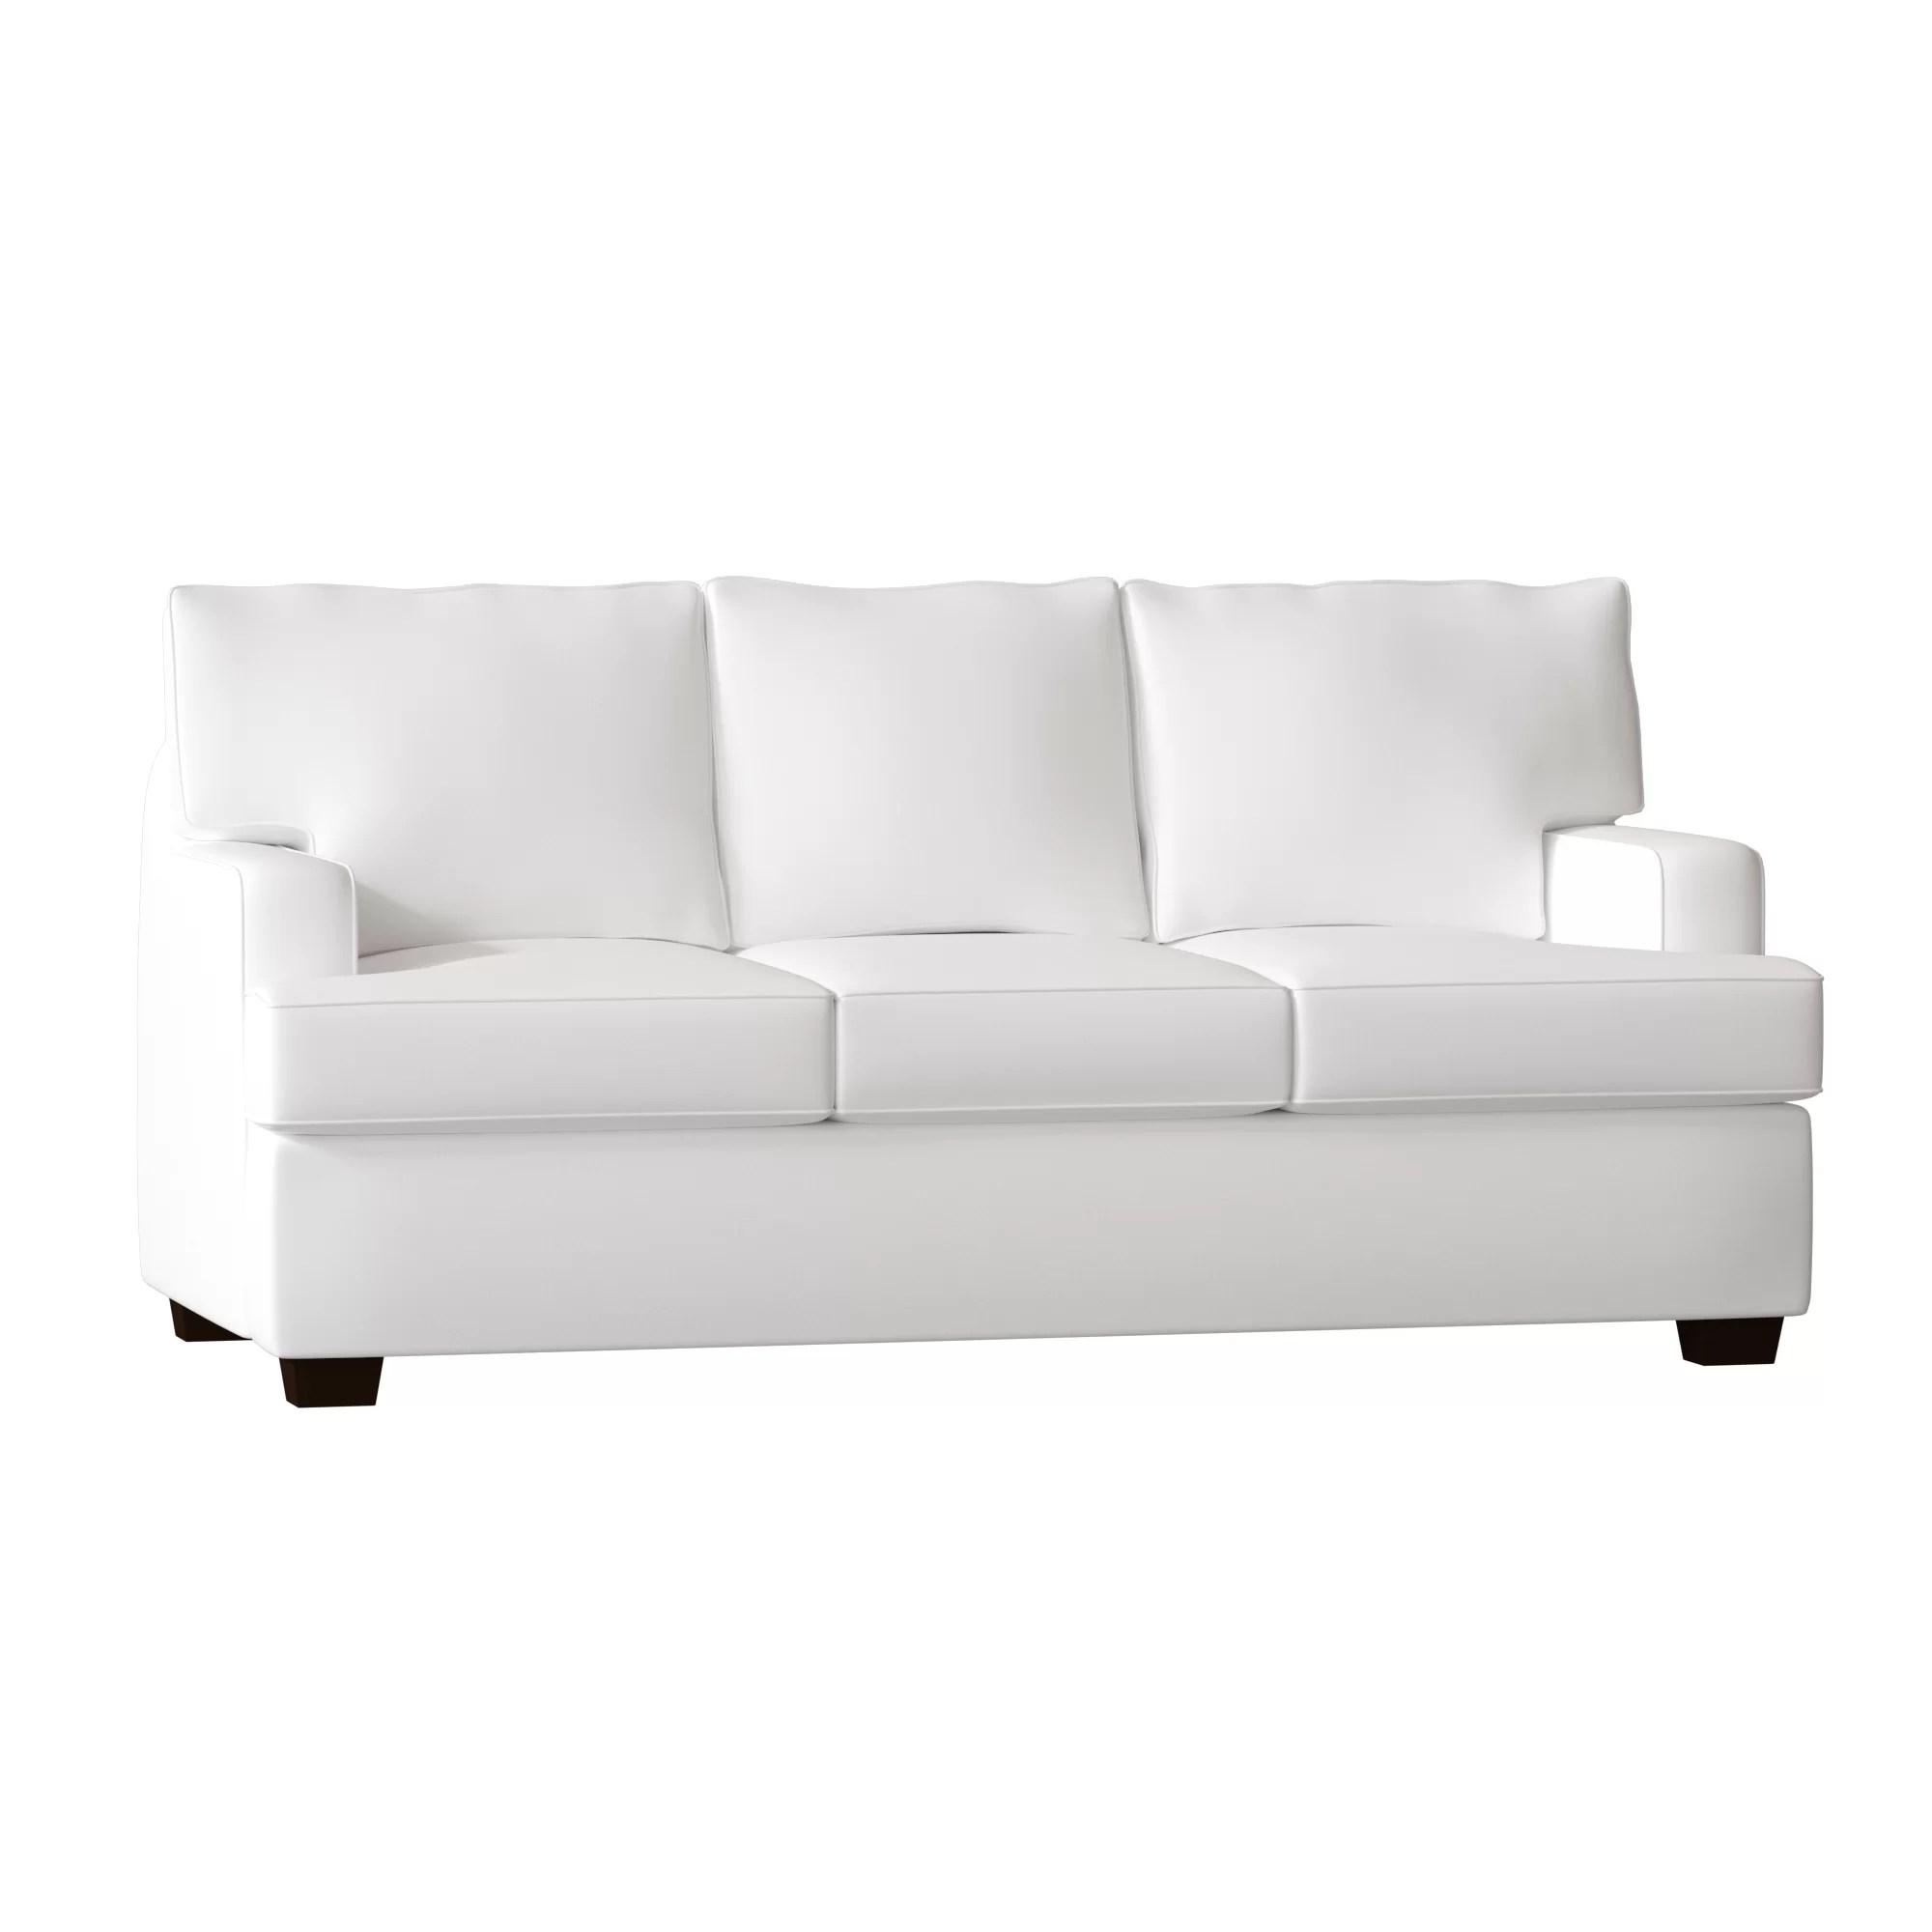 sleeper sofas chicago il chester sofa set birch lane heritage clarkedale reviews